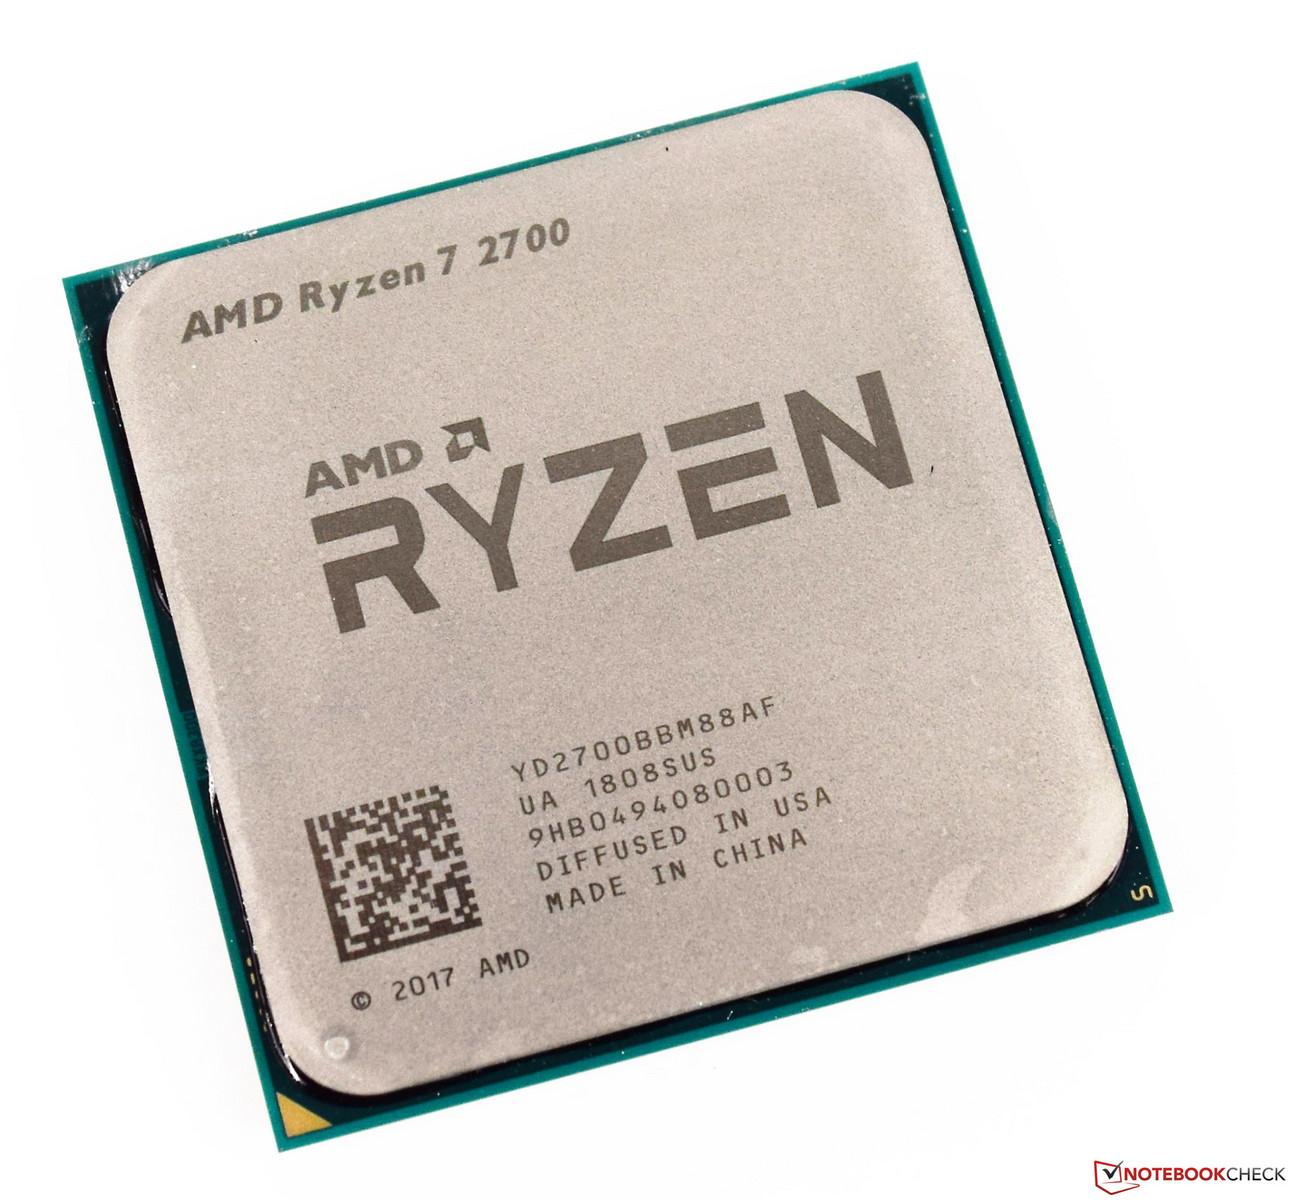 AMD Ryzen 7 2700 vs Apple A6x vs ARM Cortex A8 1 2 GHz